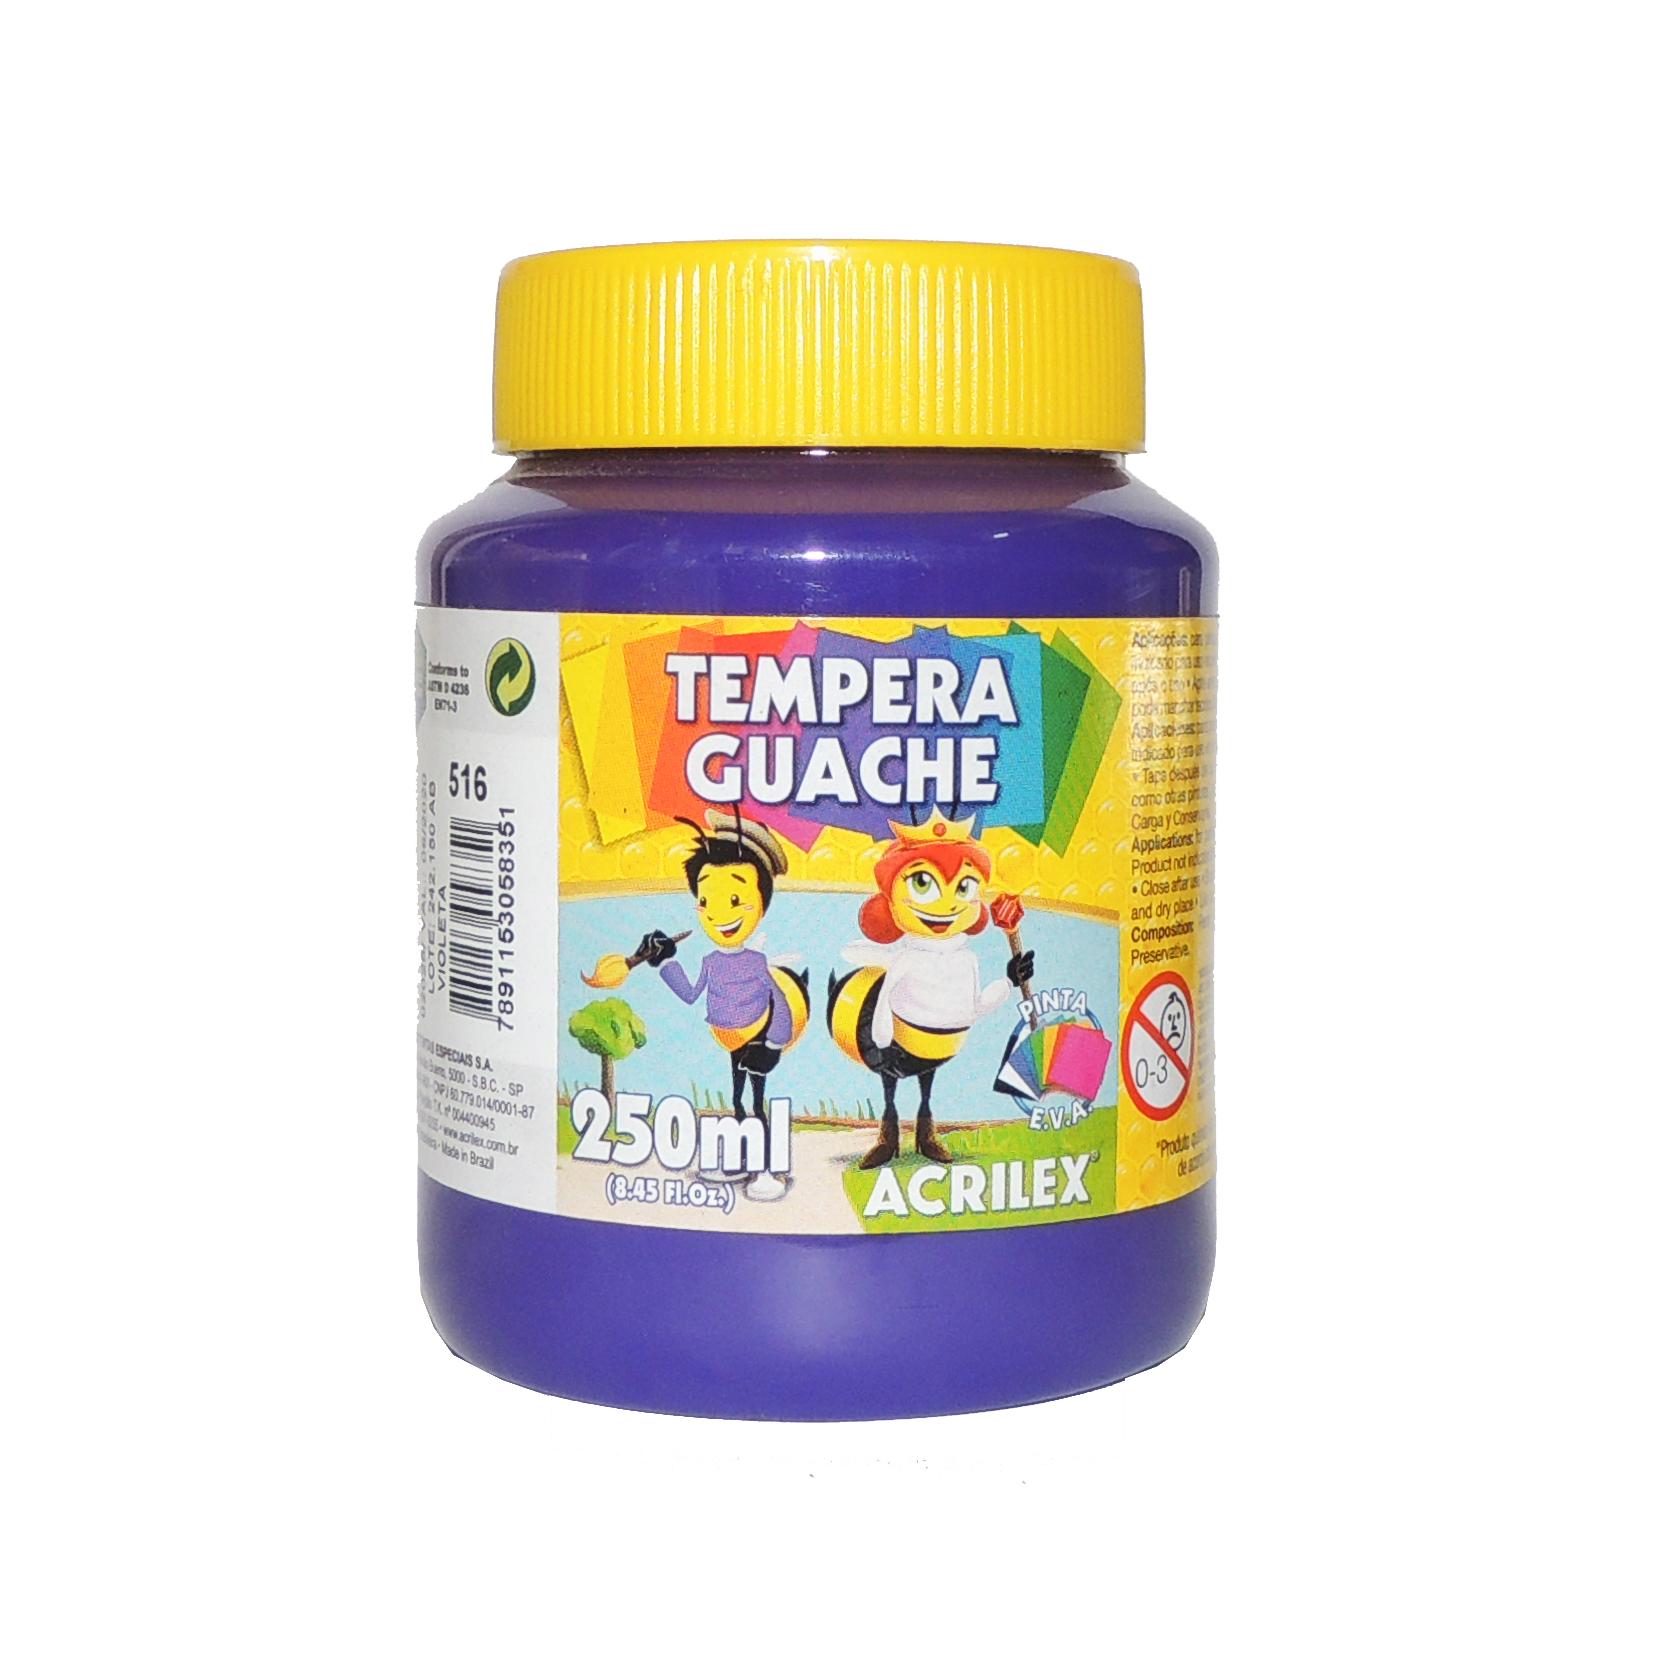 tempera-guache-250ml-516-violeta